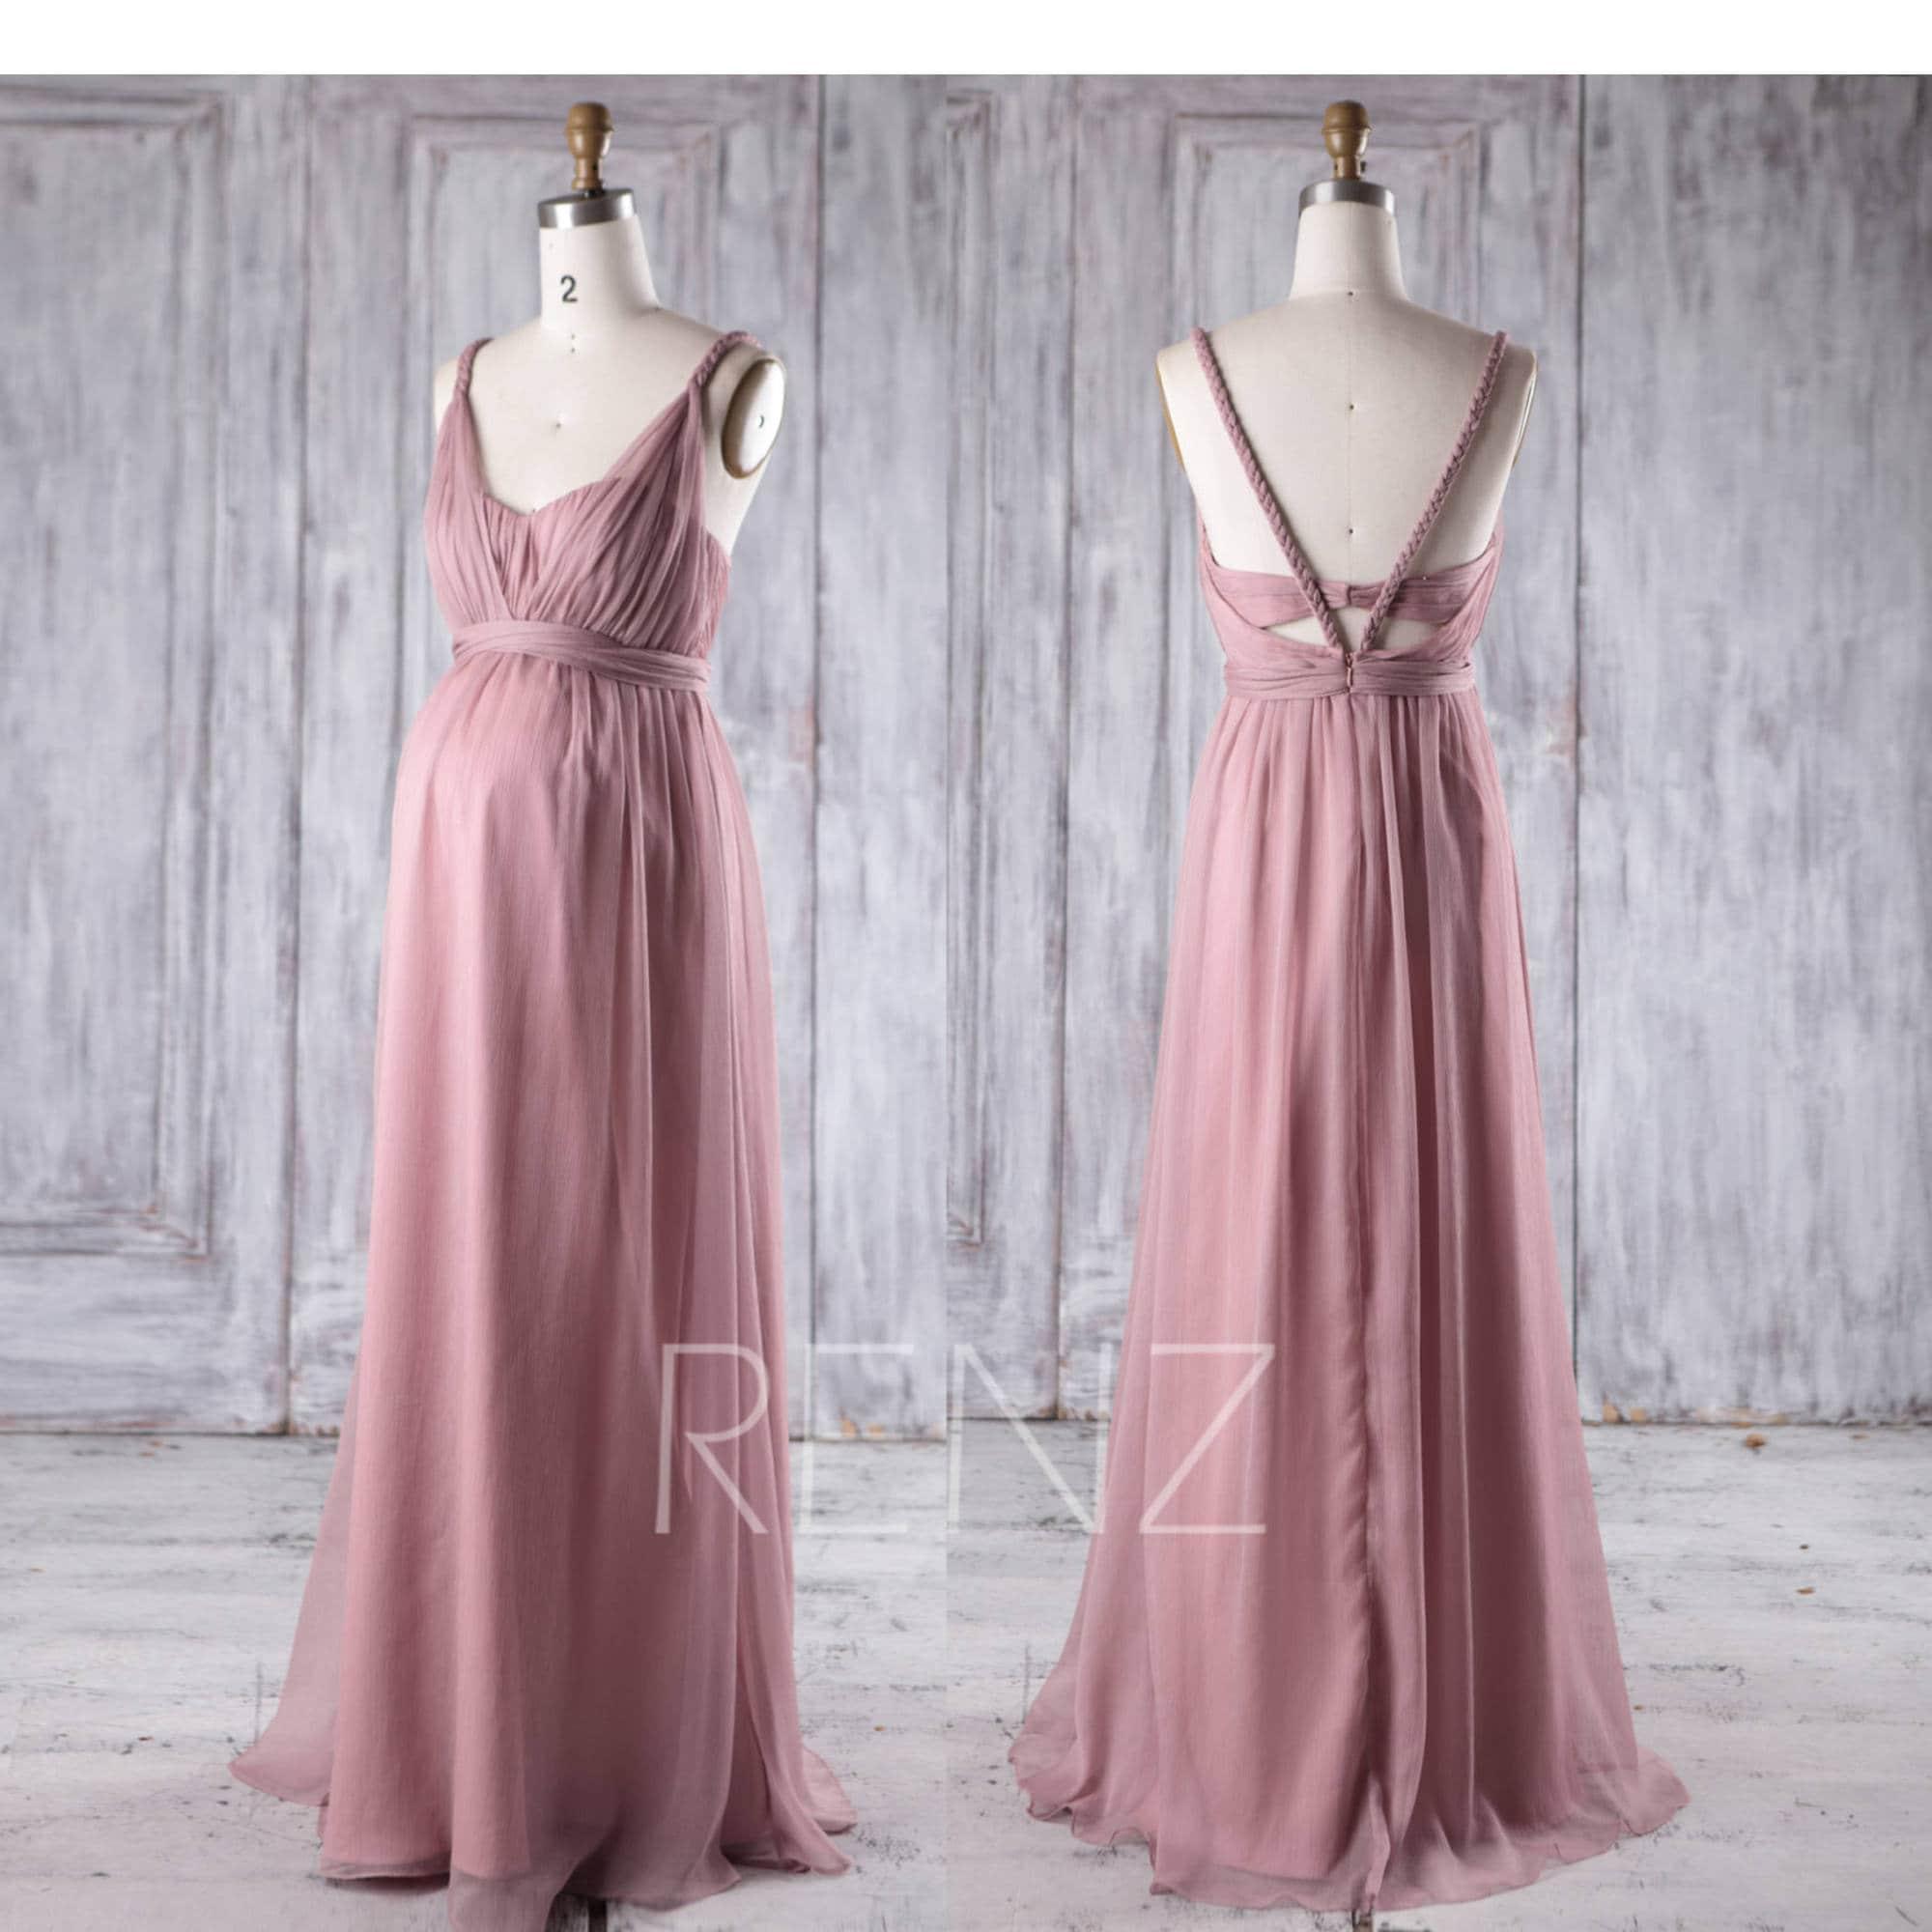 Maternity Bridesmaid DressDusty Rose Chiffon DressPlusSize